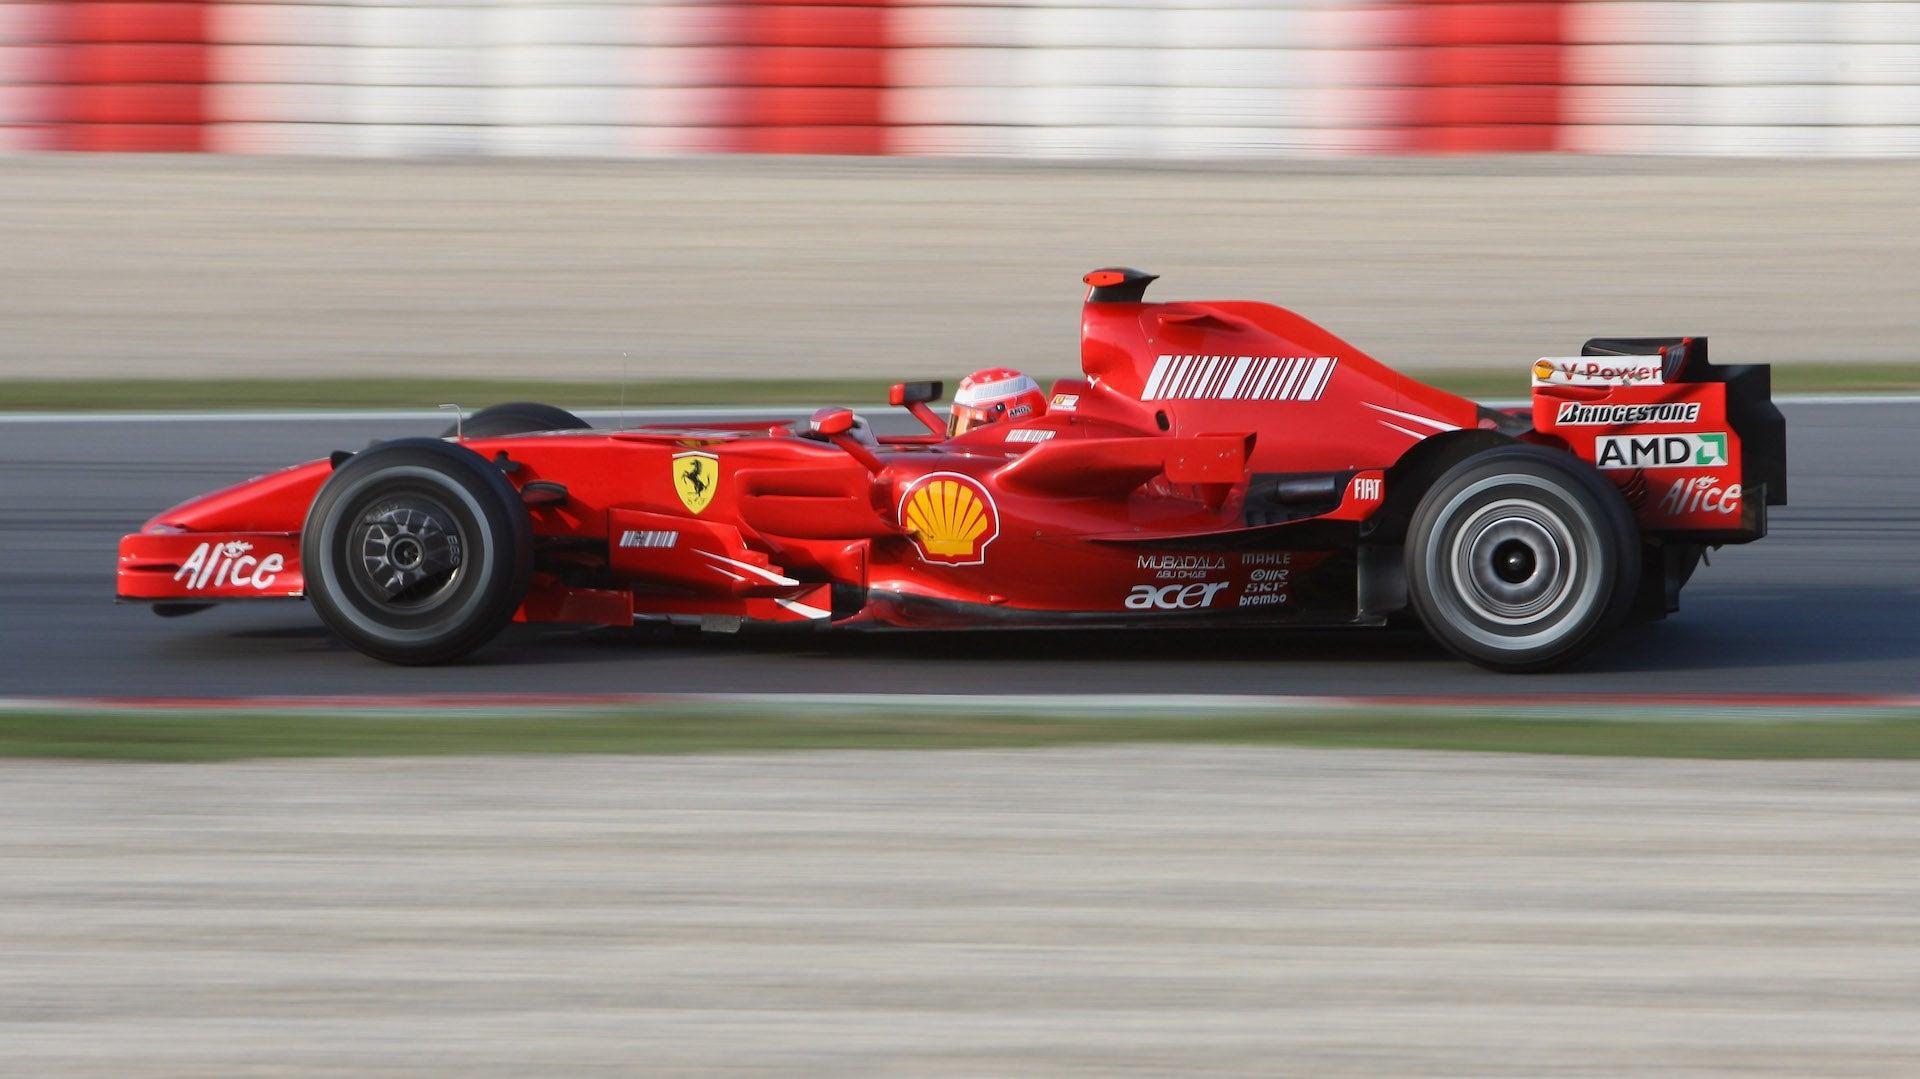 F1 Icon Michael Schumacher's Documentary Is Now Live on Netflix - Todayuknews